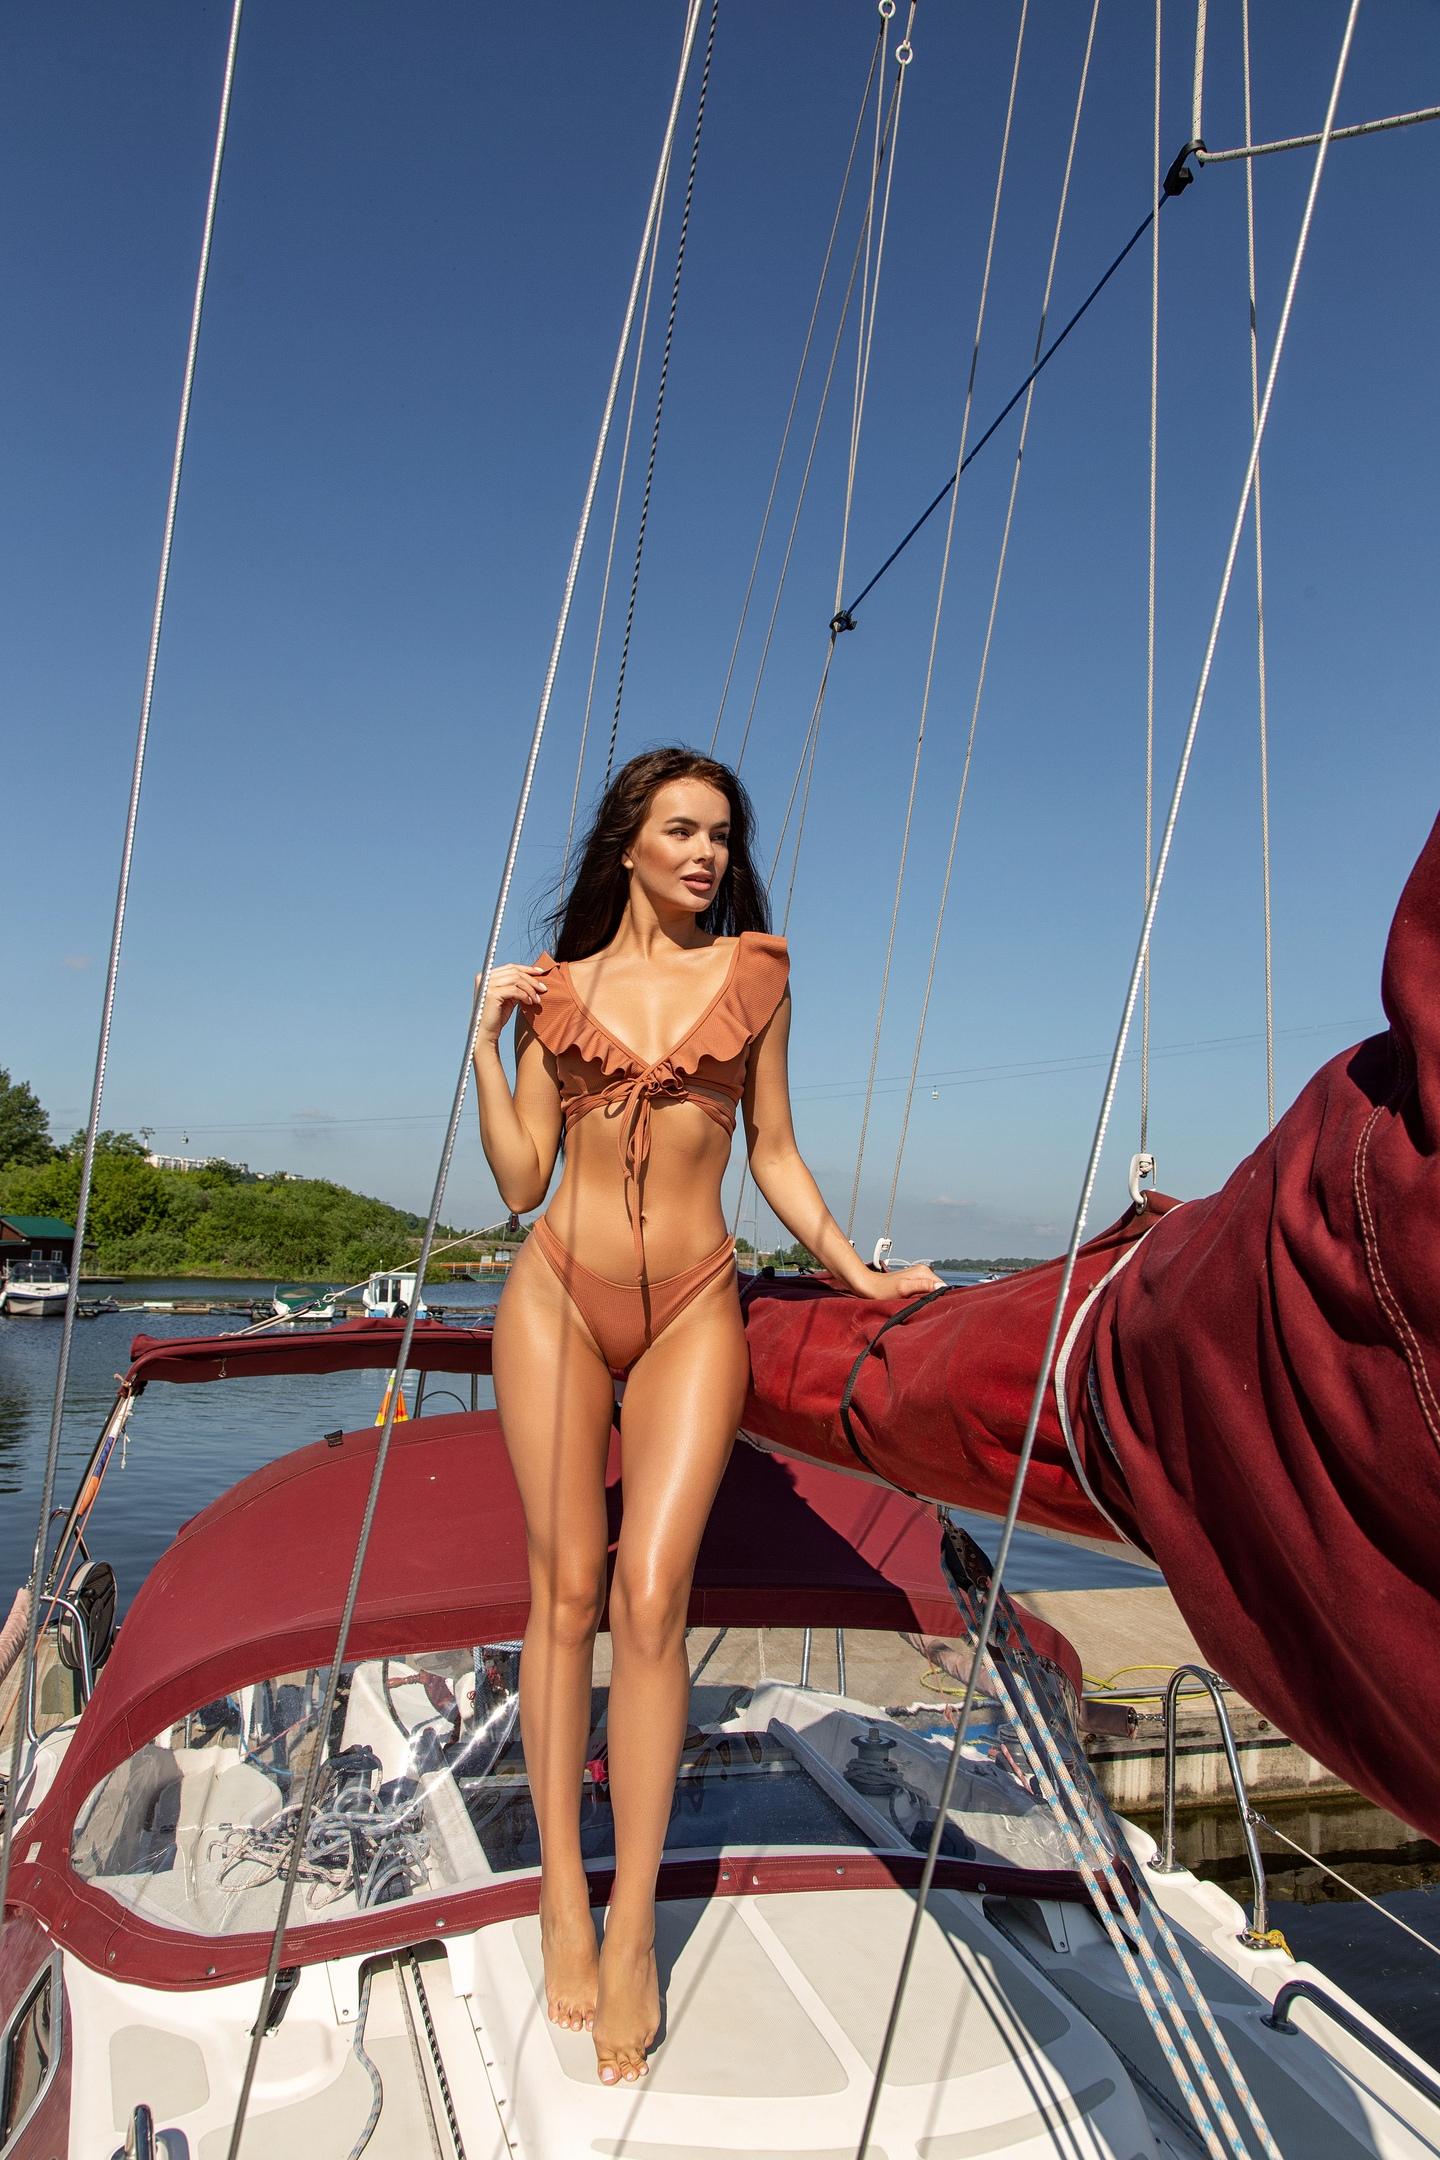 People 1440x2160 women brunette bikini yacht women outdoors water long hair the gap Kristina Borisova